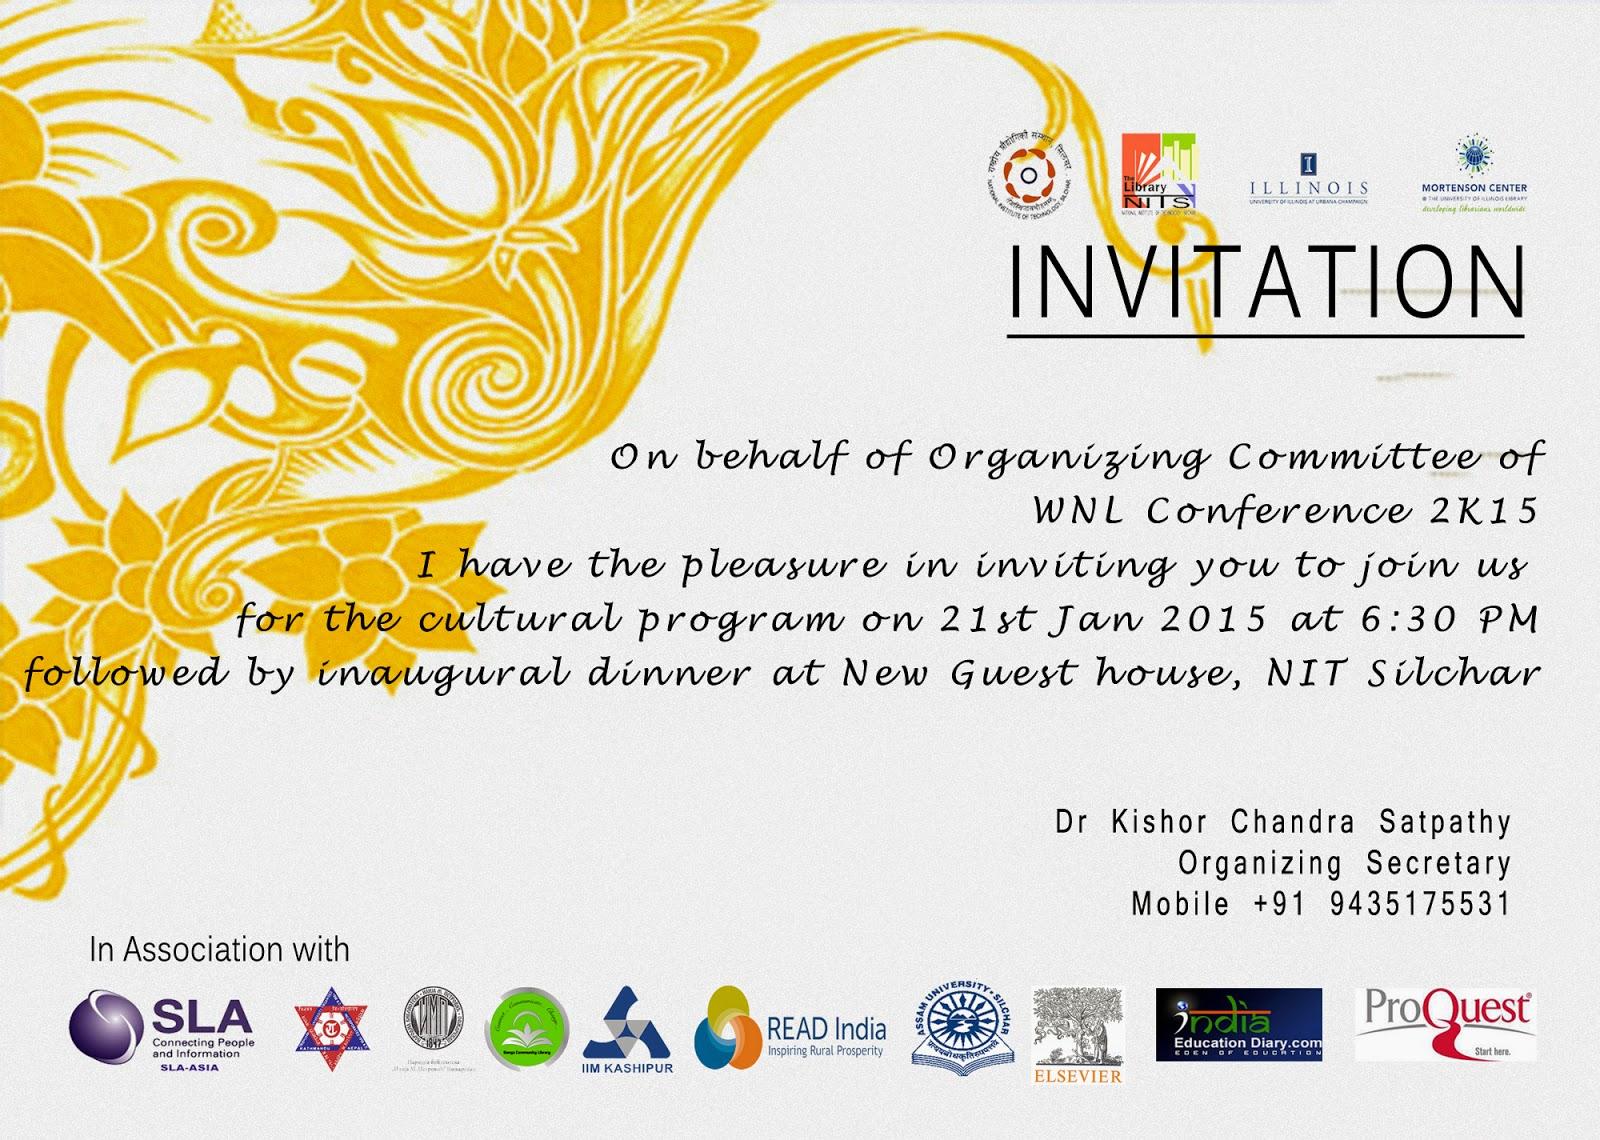 alumni meet invitation wordings for dinner